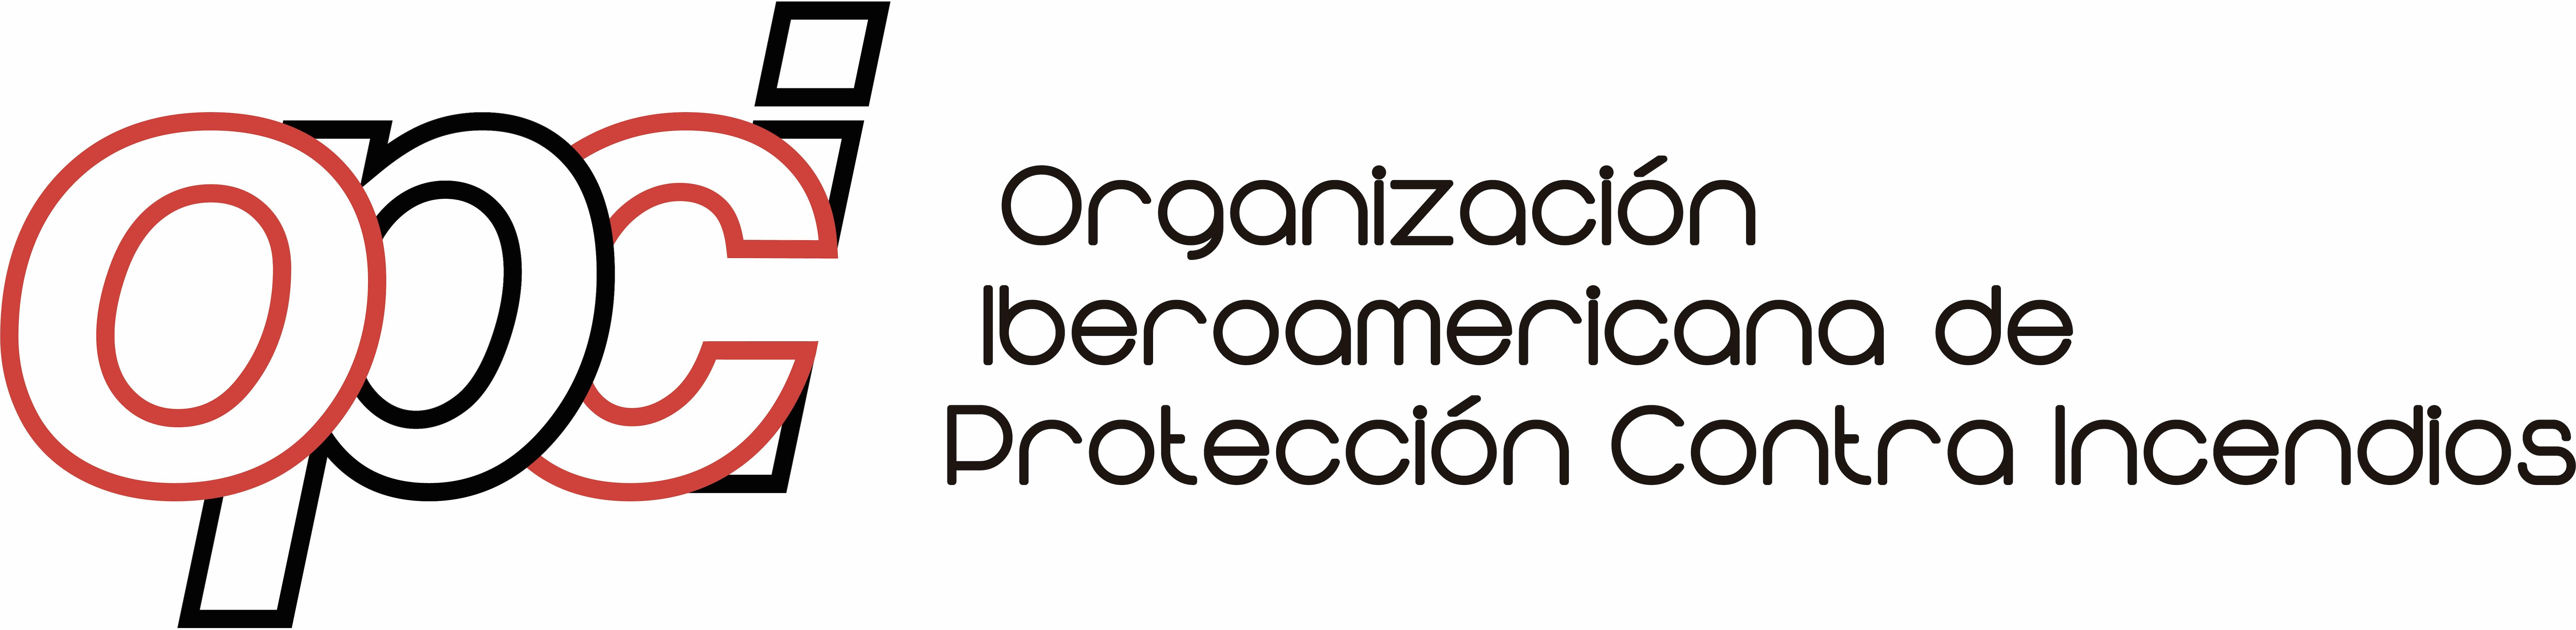 Logotipo de Organización Iberoamericana de Protección Contra Incendios Opci